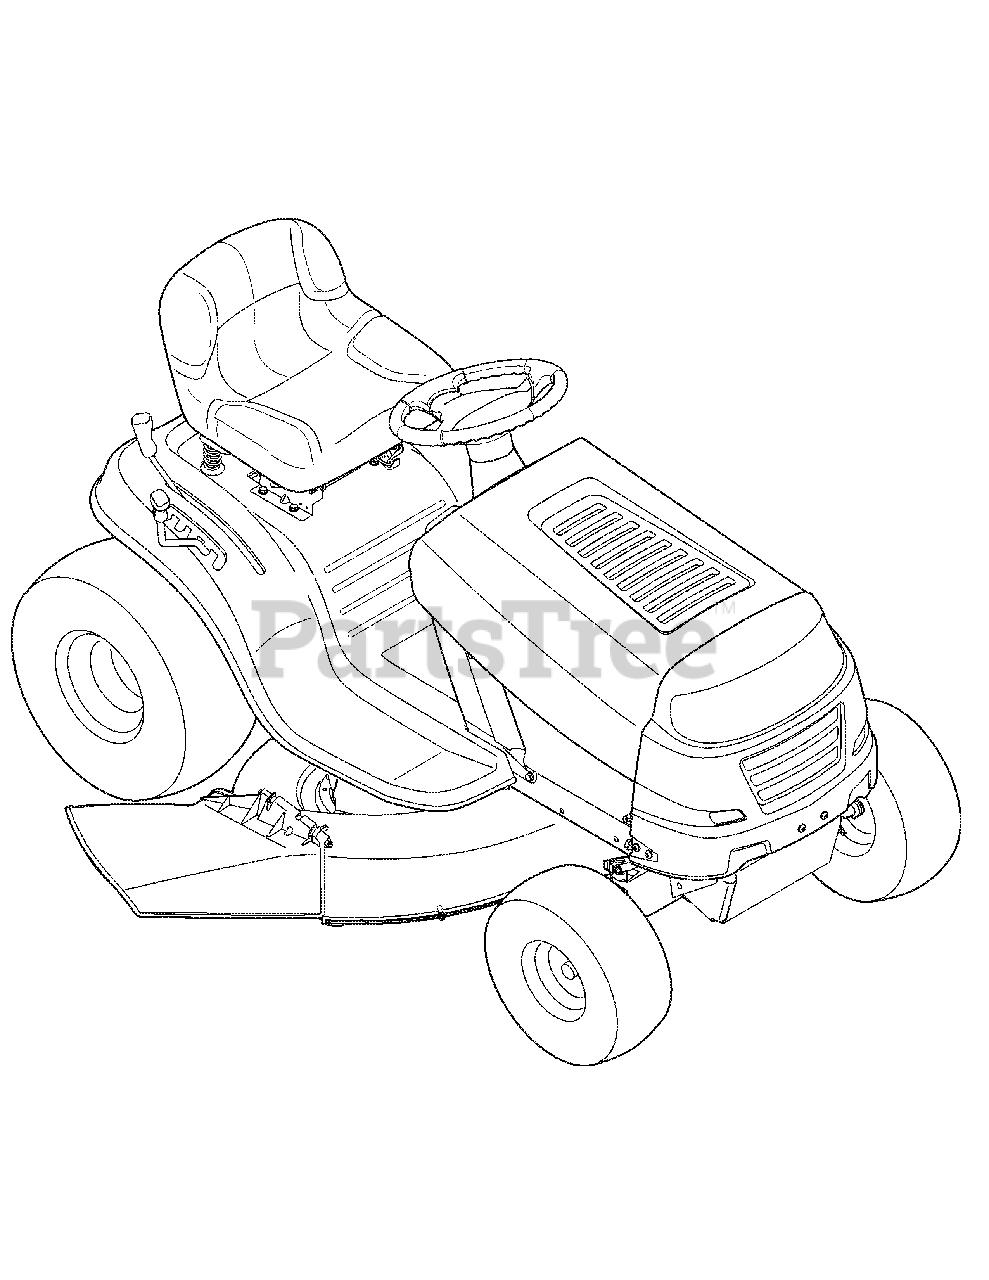 BOLENS SCHEMATICS - Auto Electrical Wiring Diagram